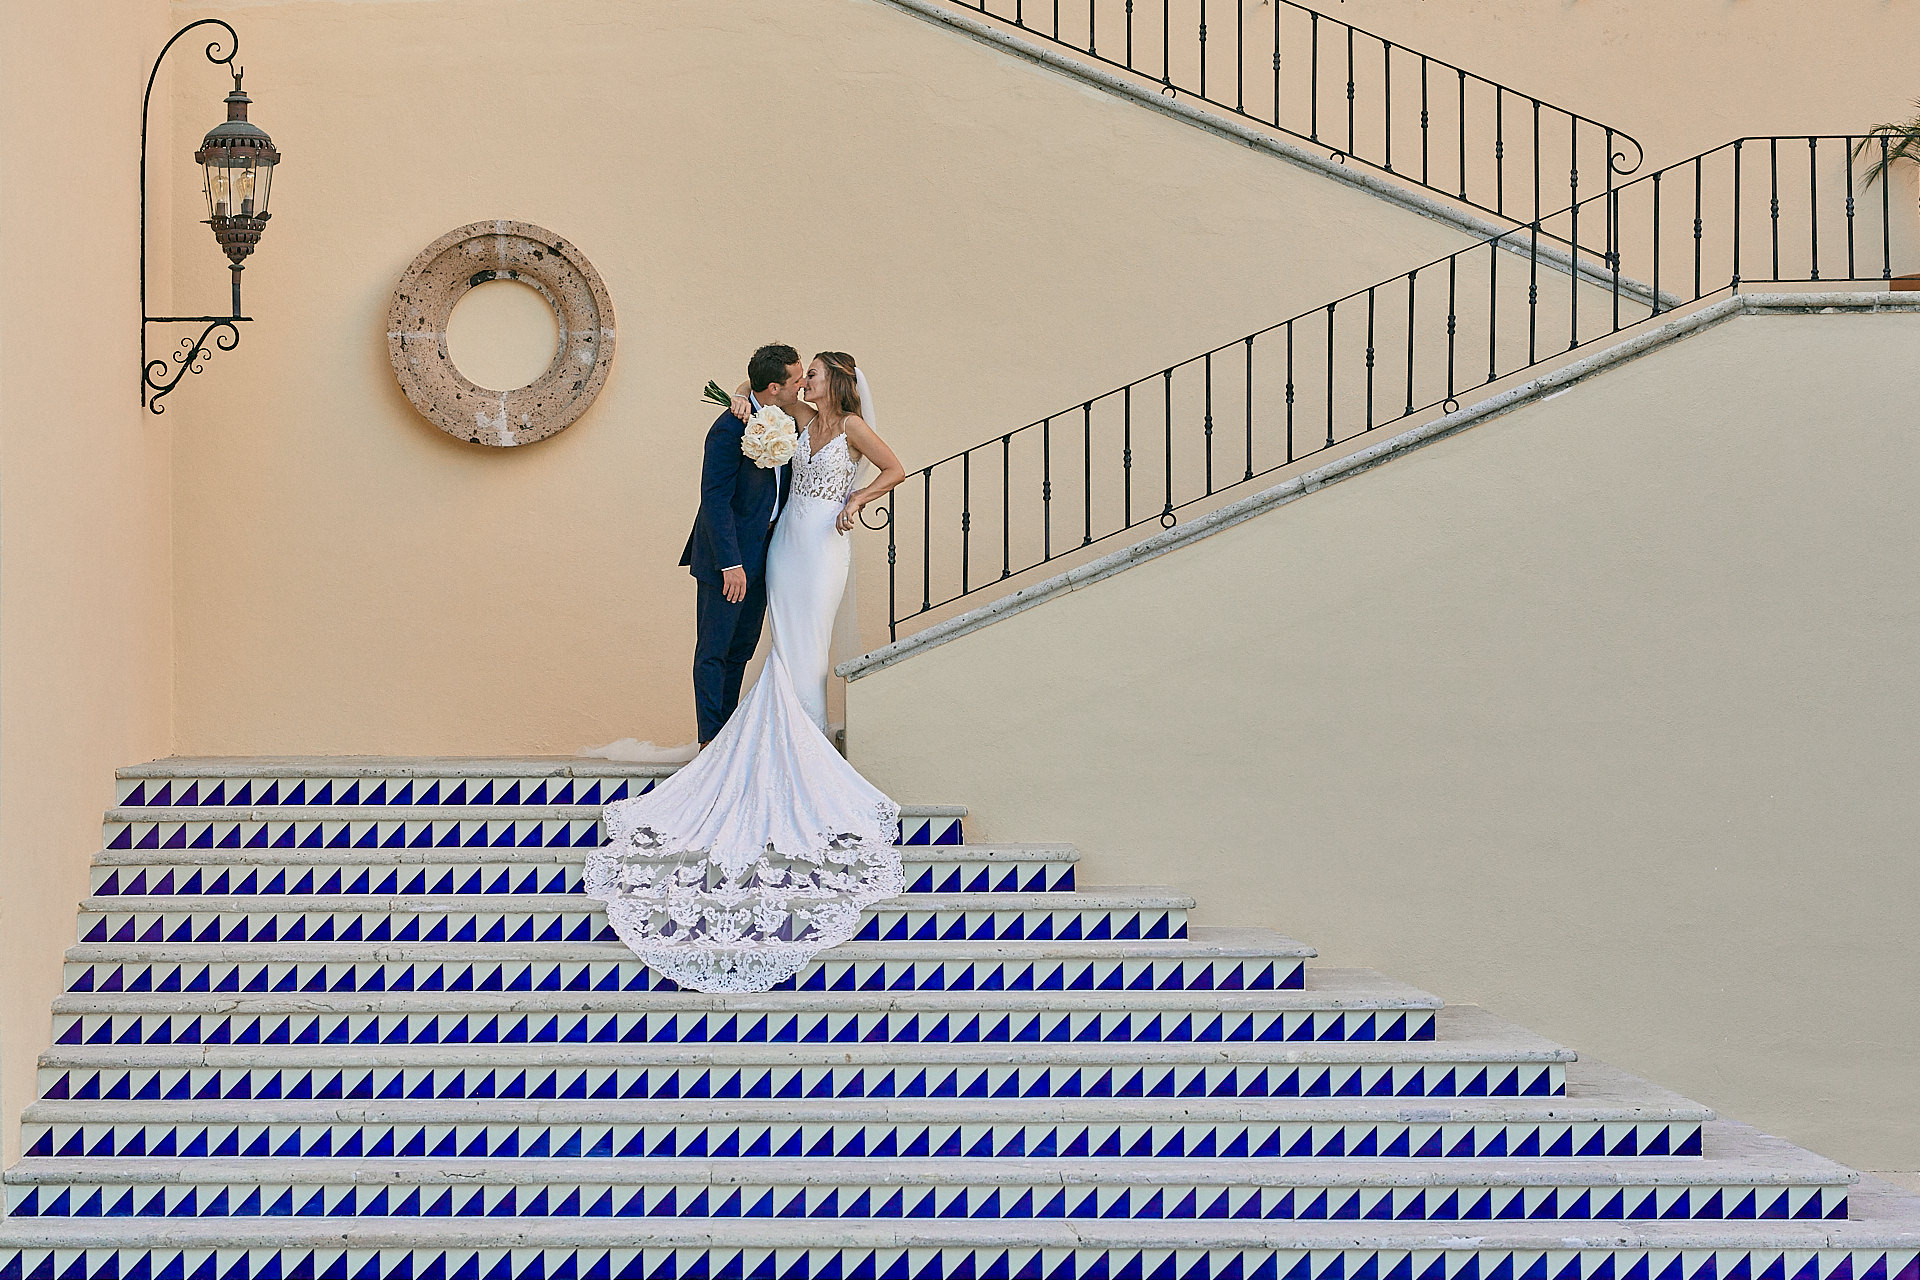 Exclusive Destination Wedding Photographer In Cabo